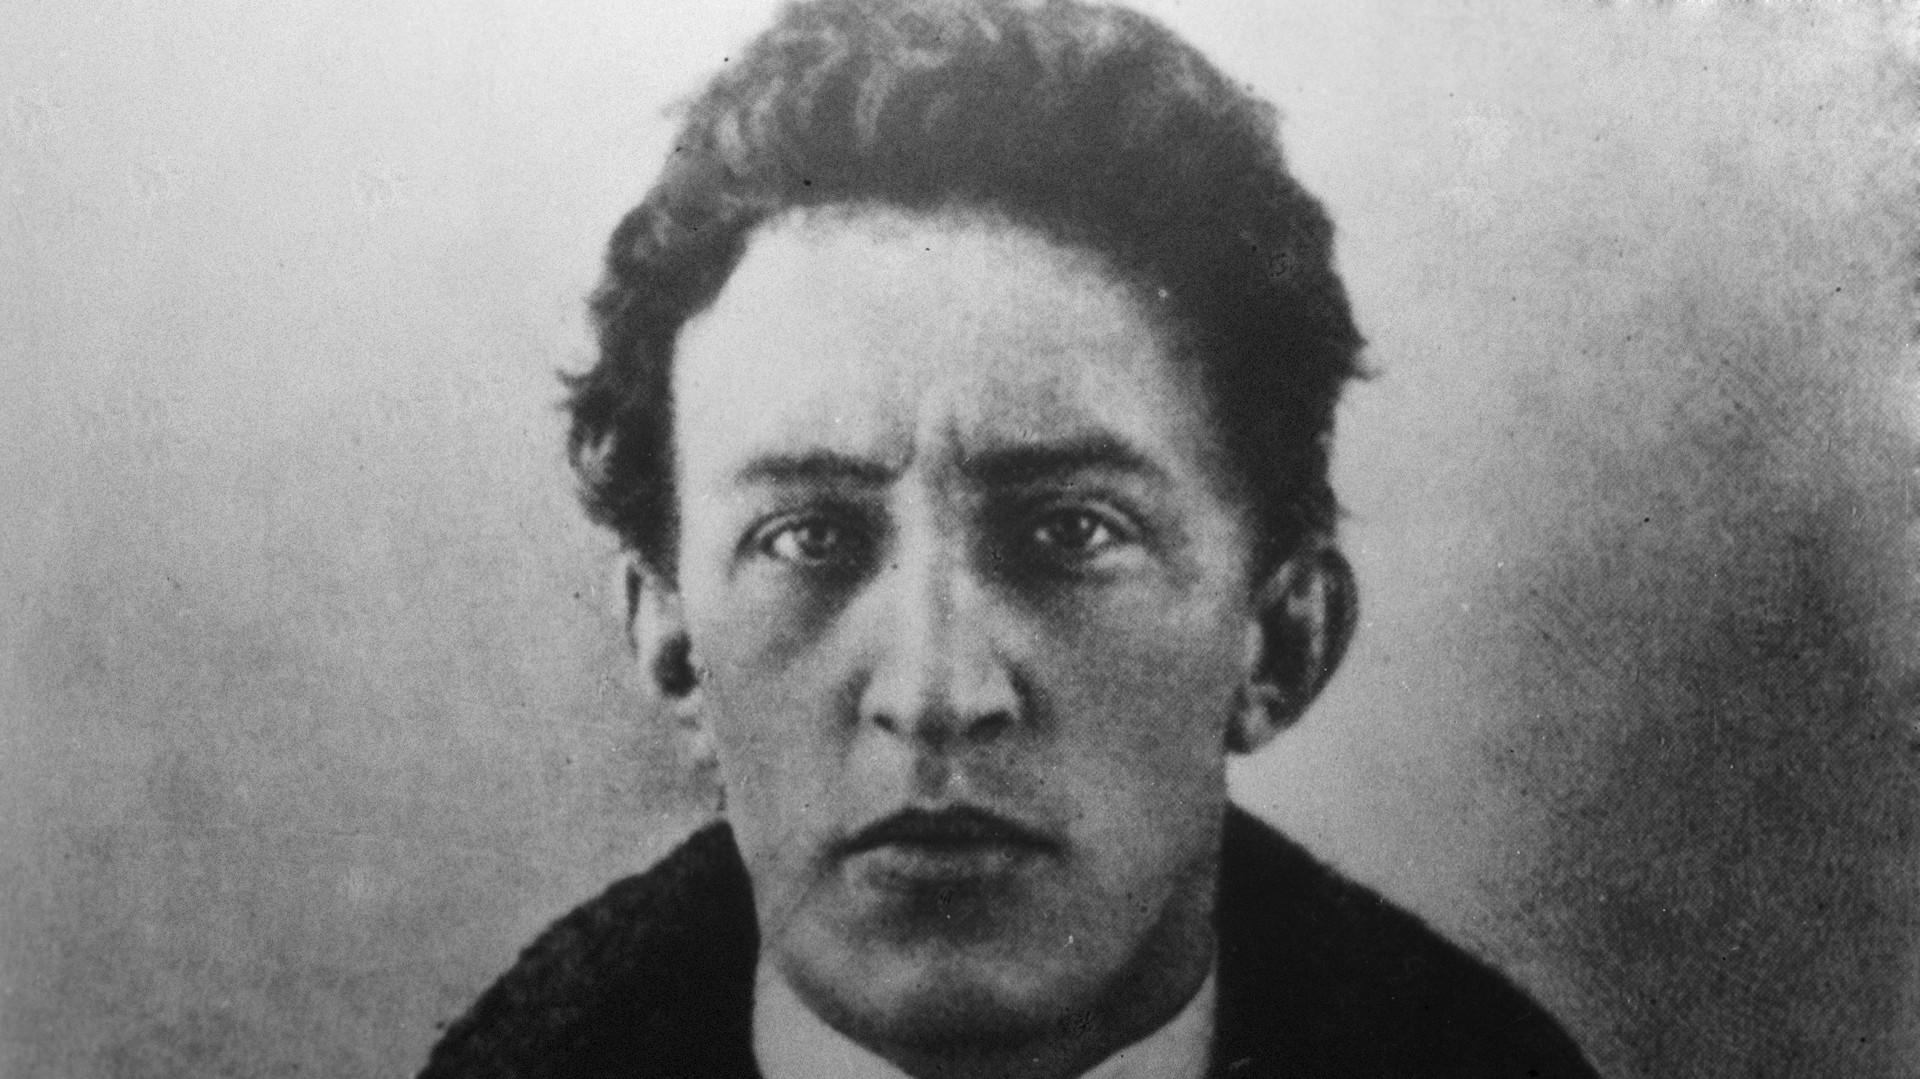 Тест RT о поэте Серебряного века: Блок или не Блок?